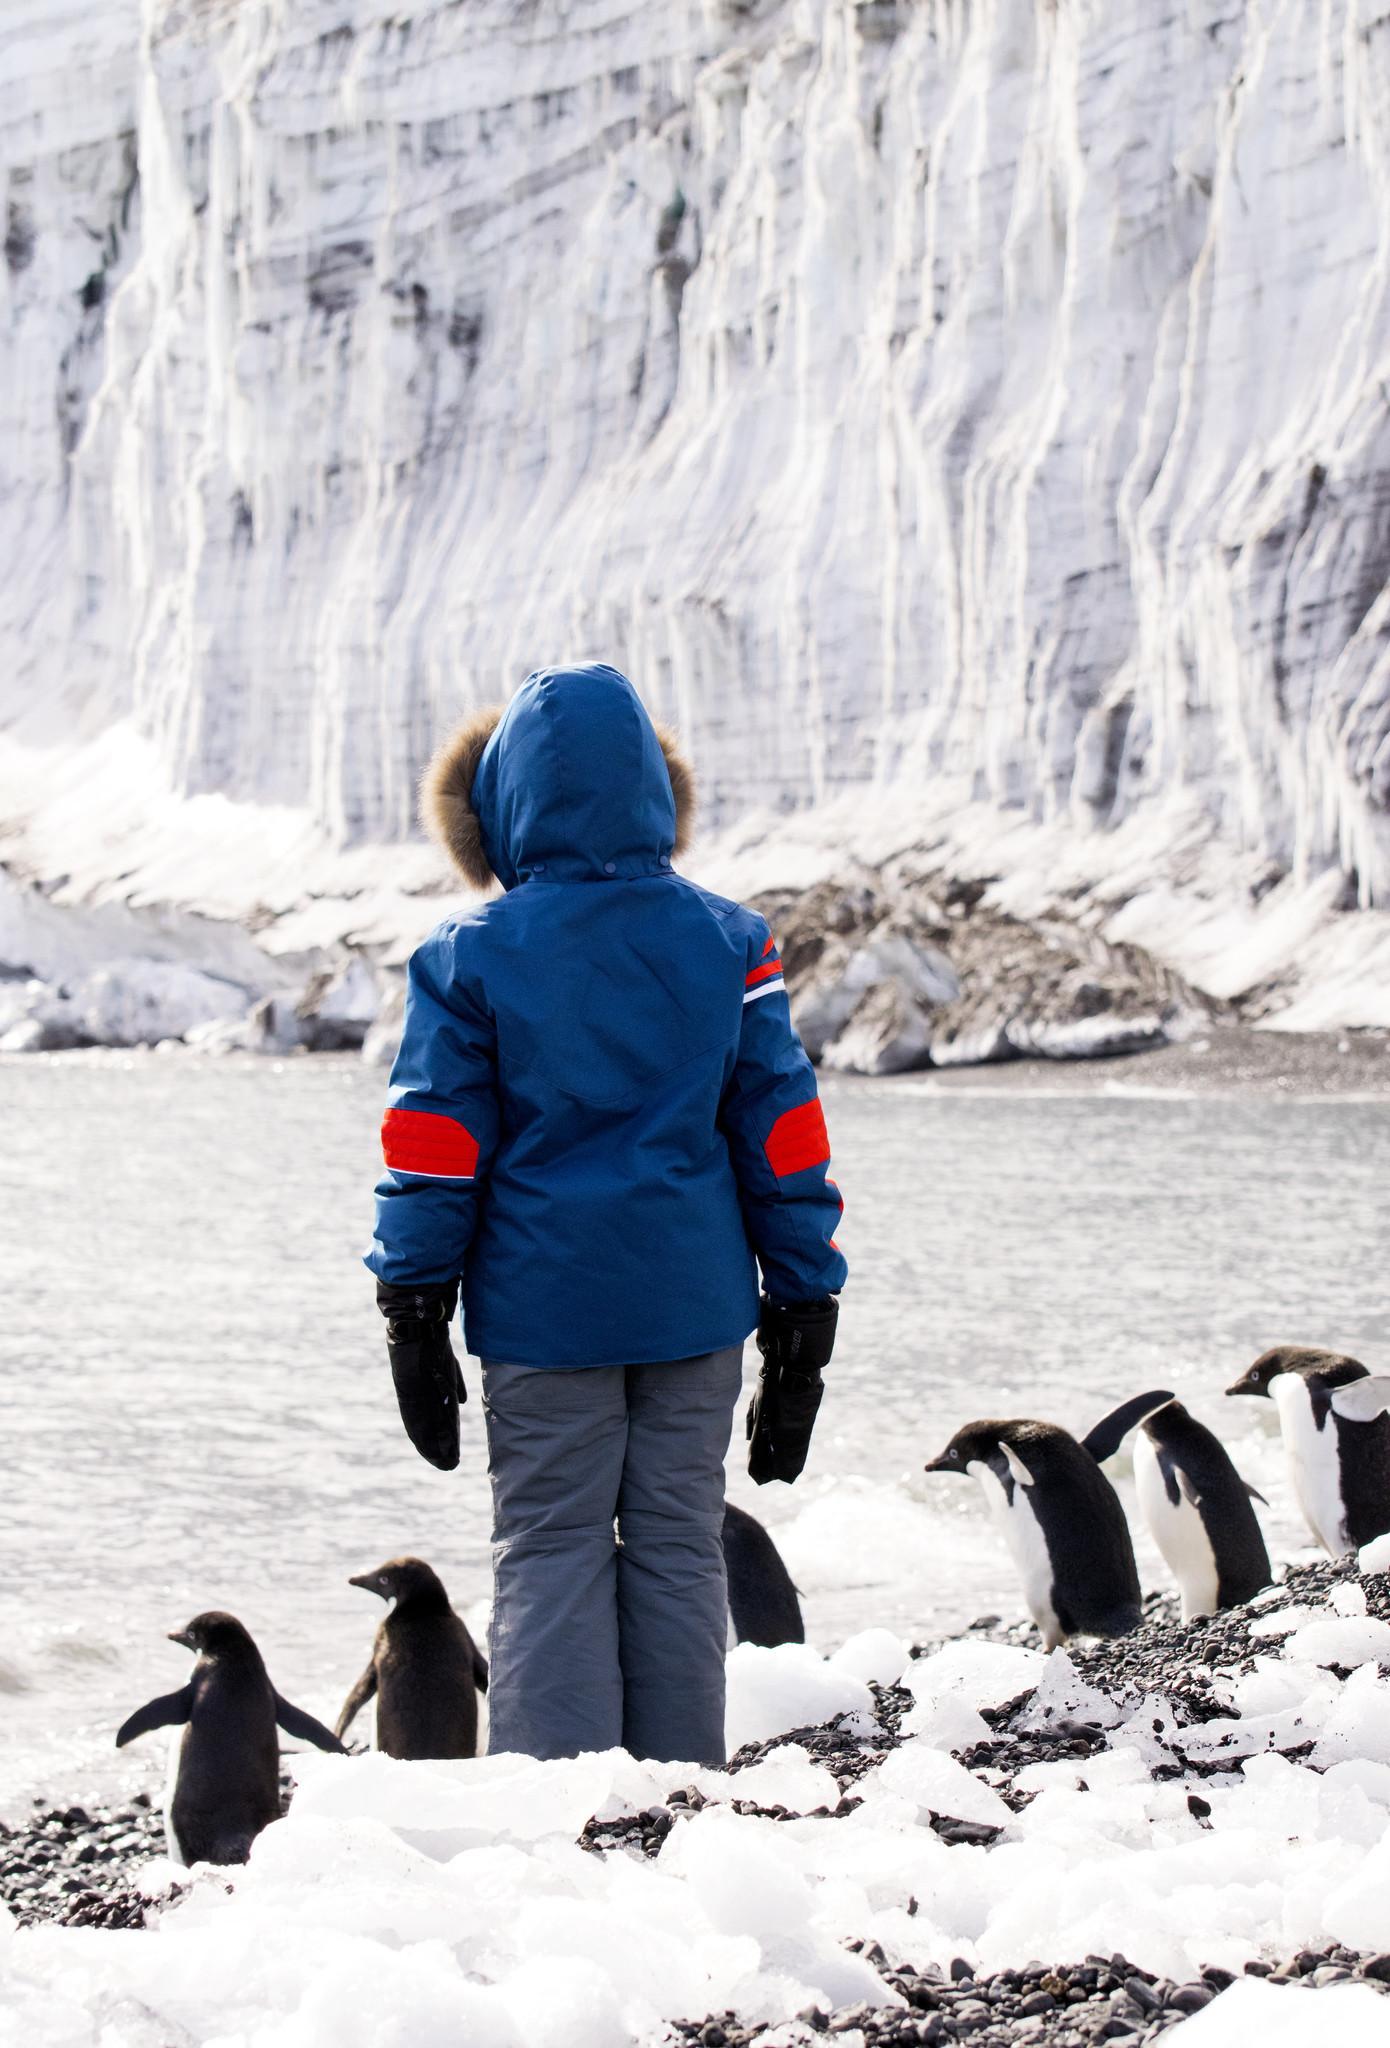 Nikolai and the penguins in Antarctica.